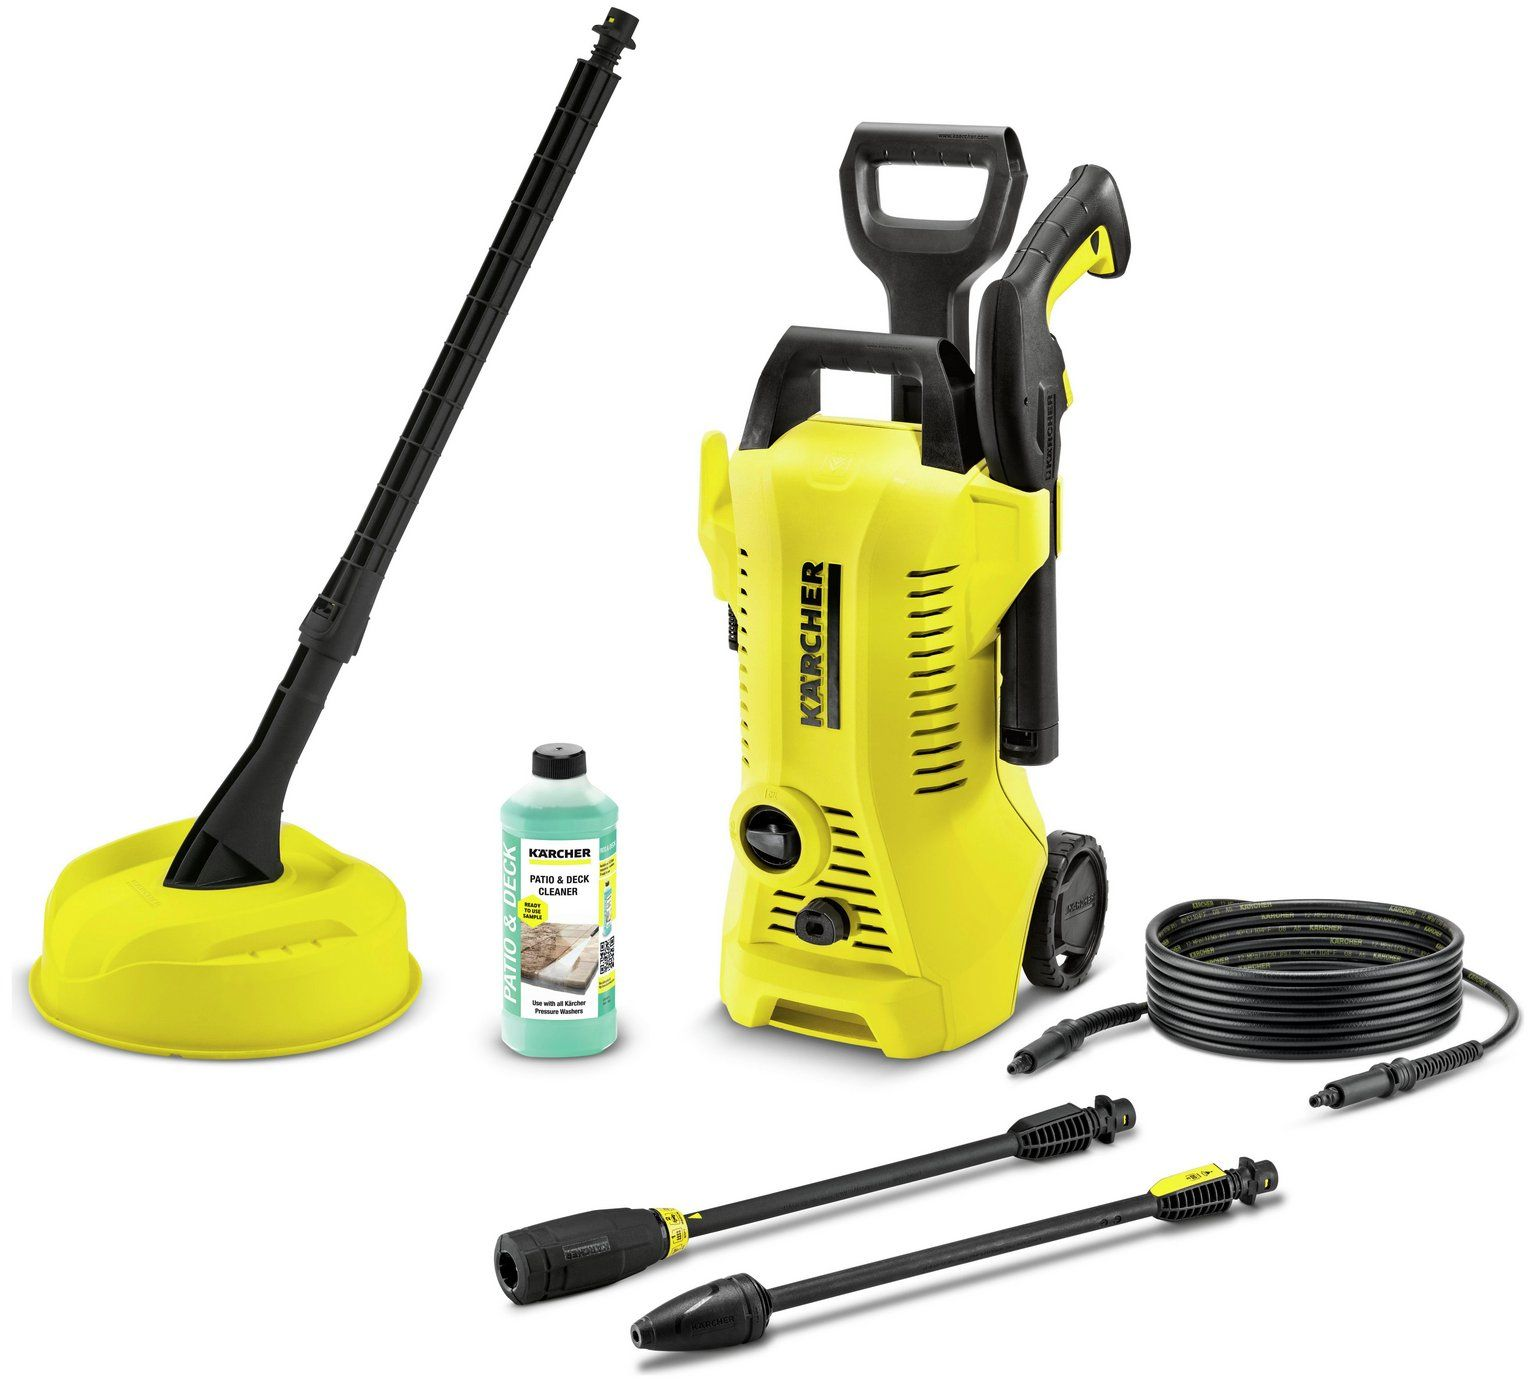 Buy Karcher K2 Full Control Home Pressure Washer 1400w Pressure Washers Argos Pressure Washer Car Cleaning Garden Power Tools